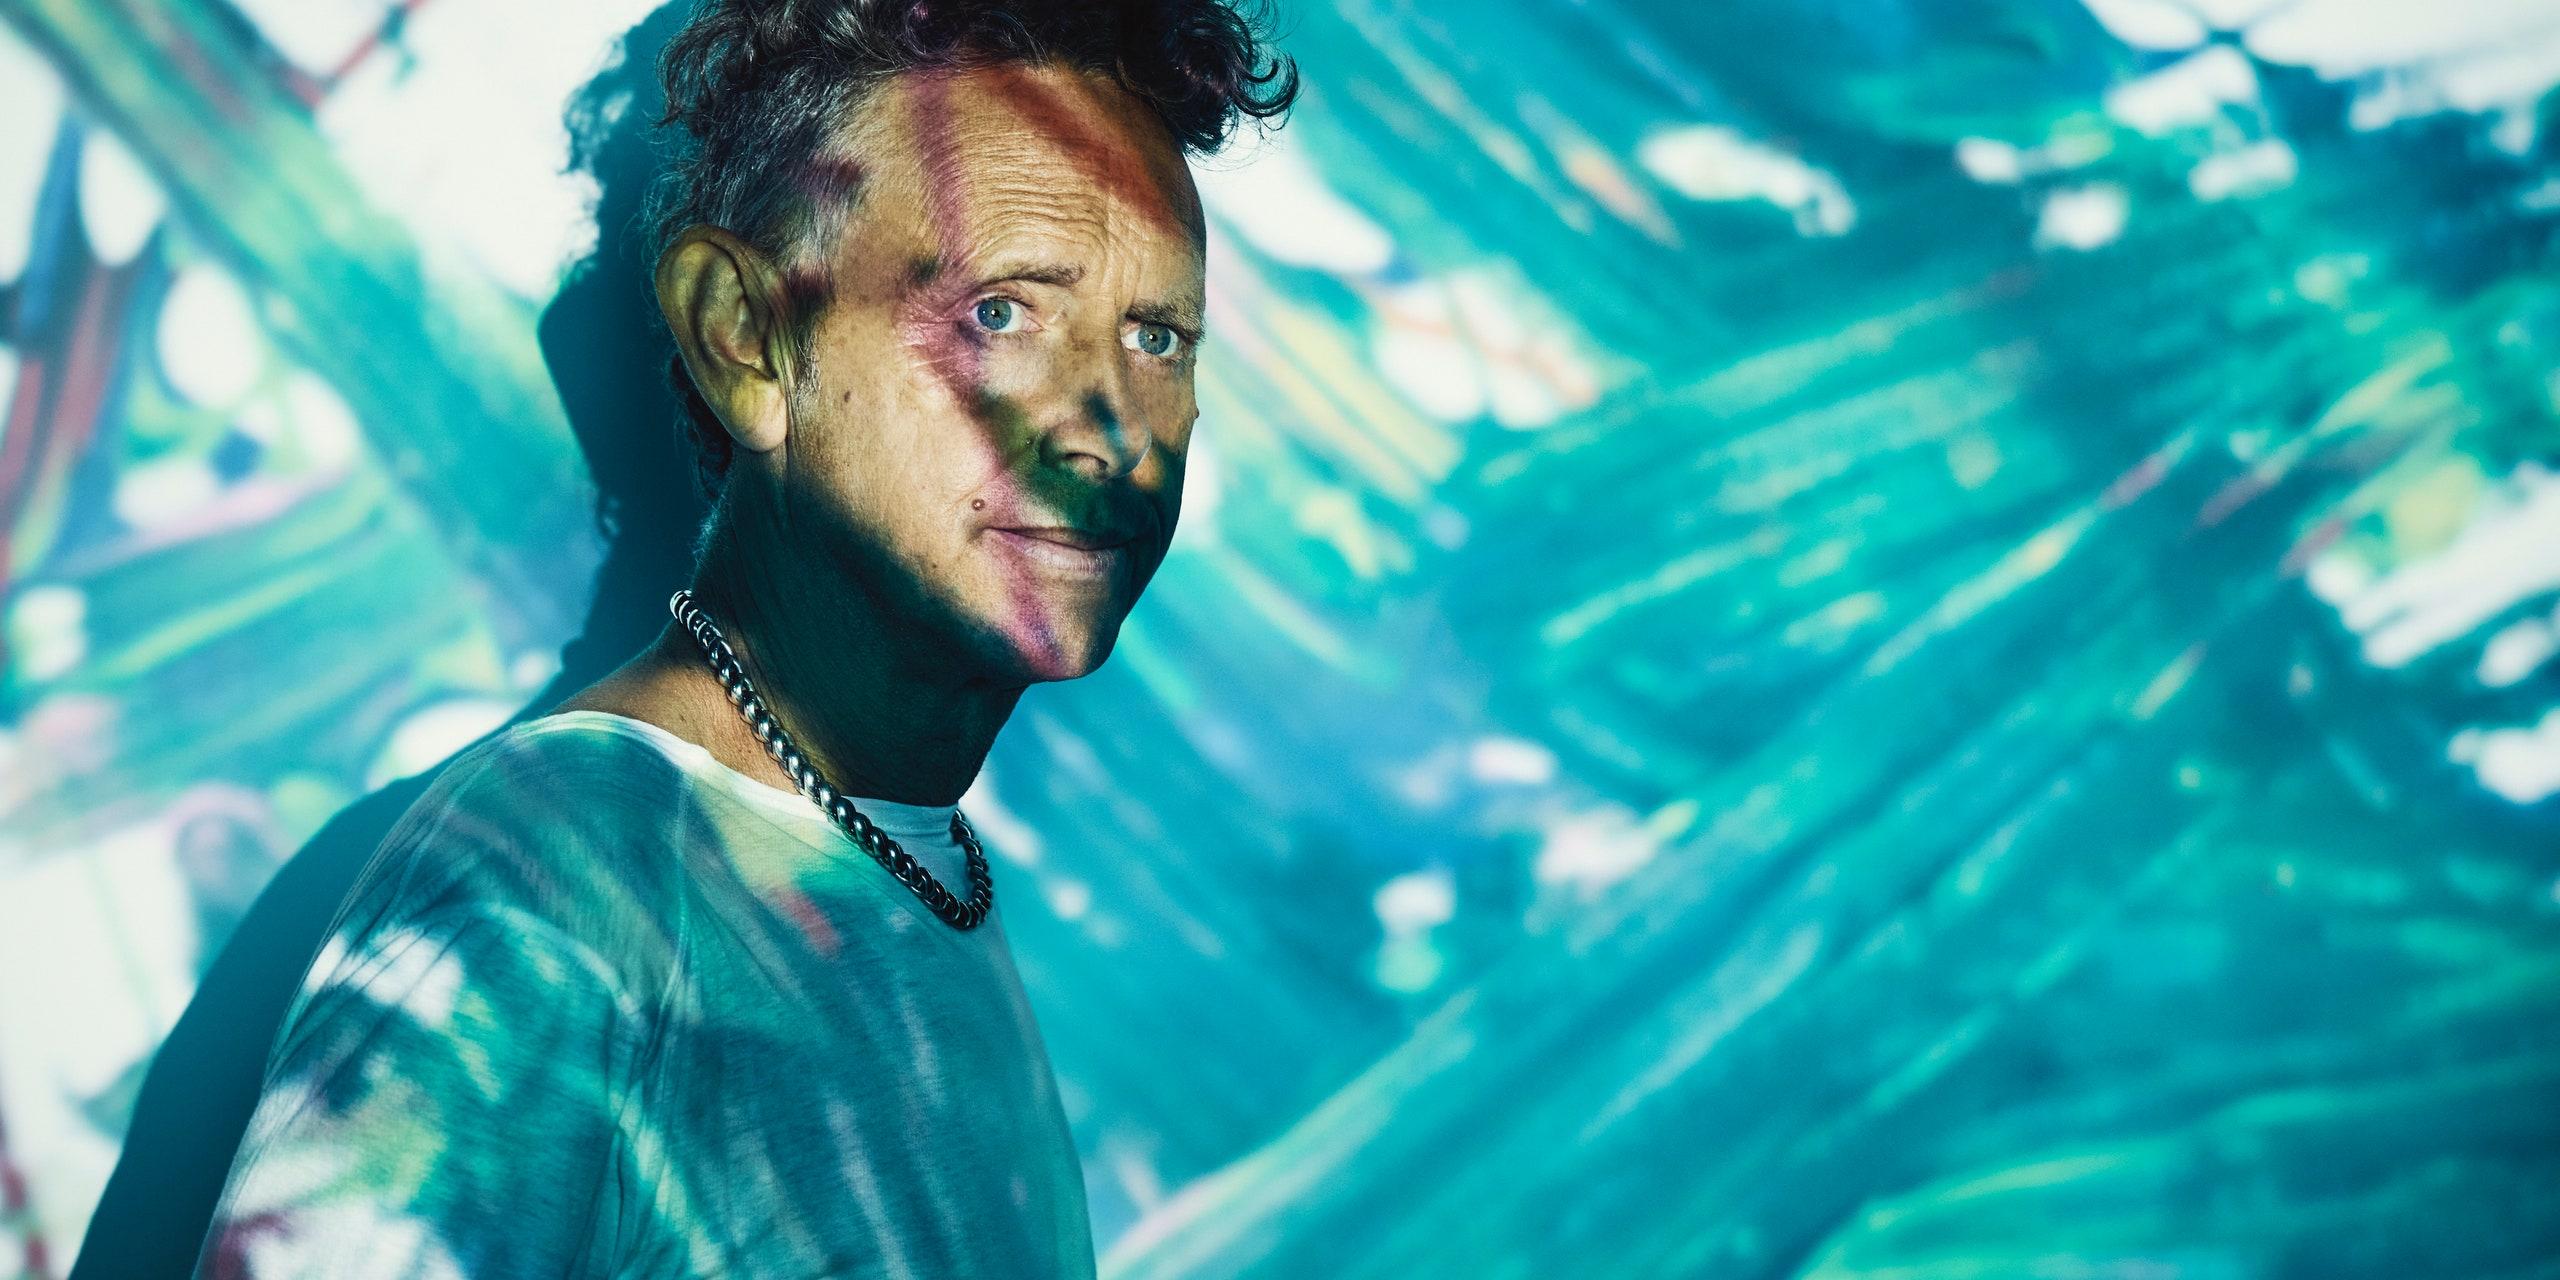 DEPECHE MODE'S MARTIN GORE RELEASES DARK NEW SINGLE 'MANDRILL' AND ANNOUNCES NEW EP